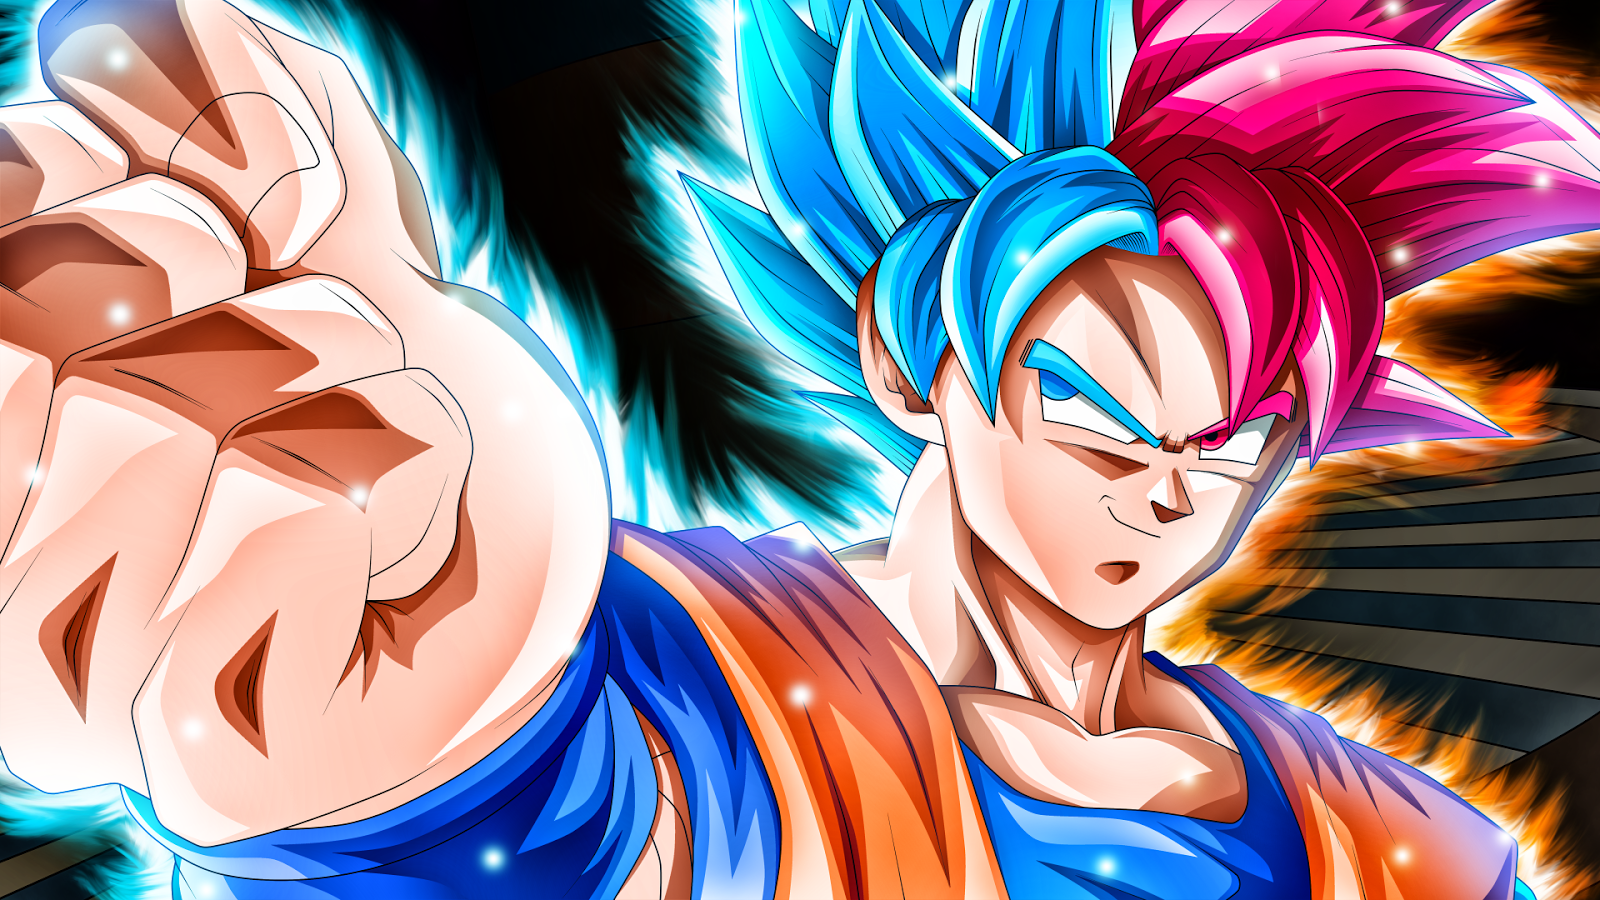 Free Son Goku Super Saiyan Blue Wallpaper Images For Wallpaper